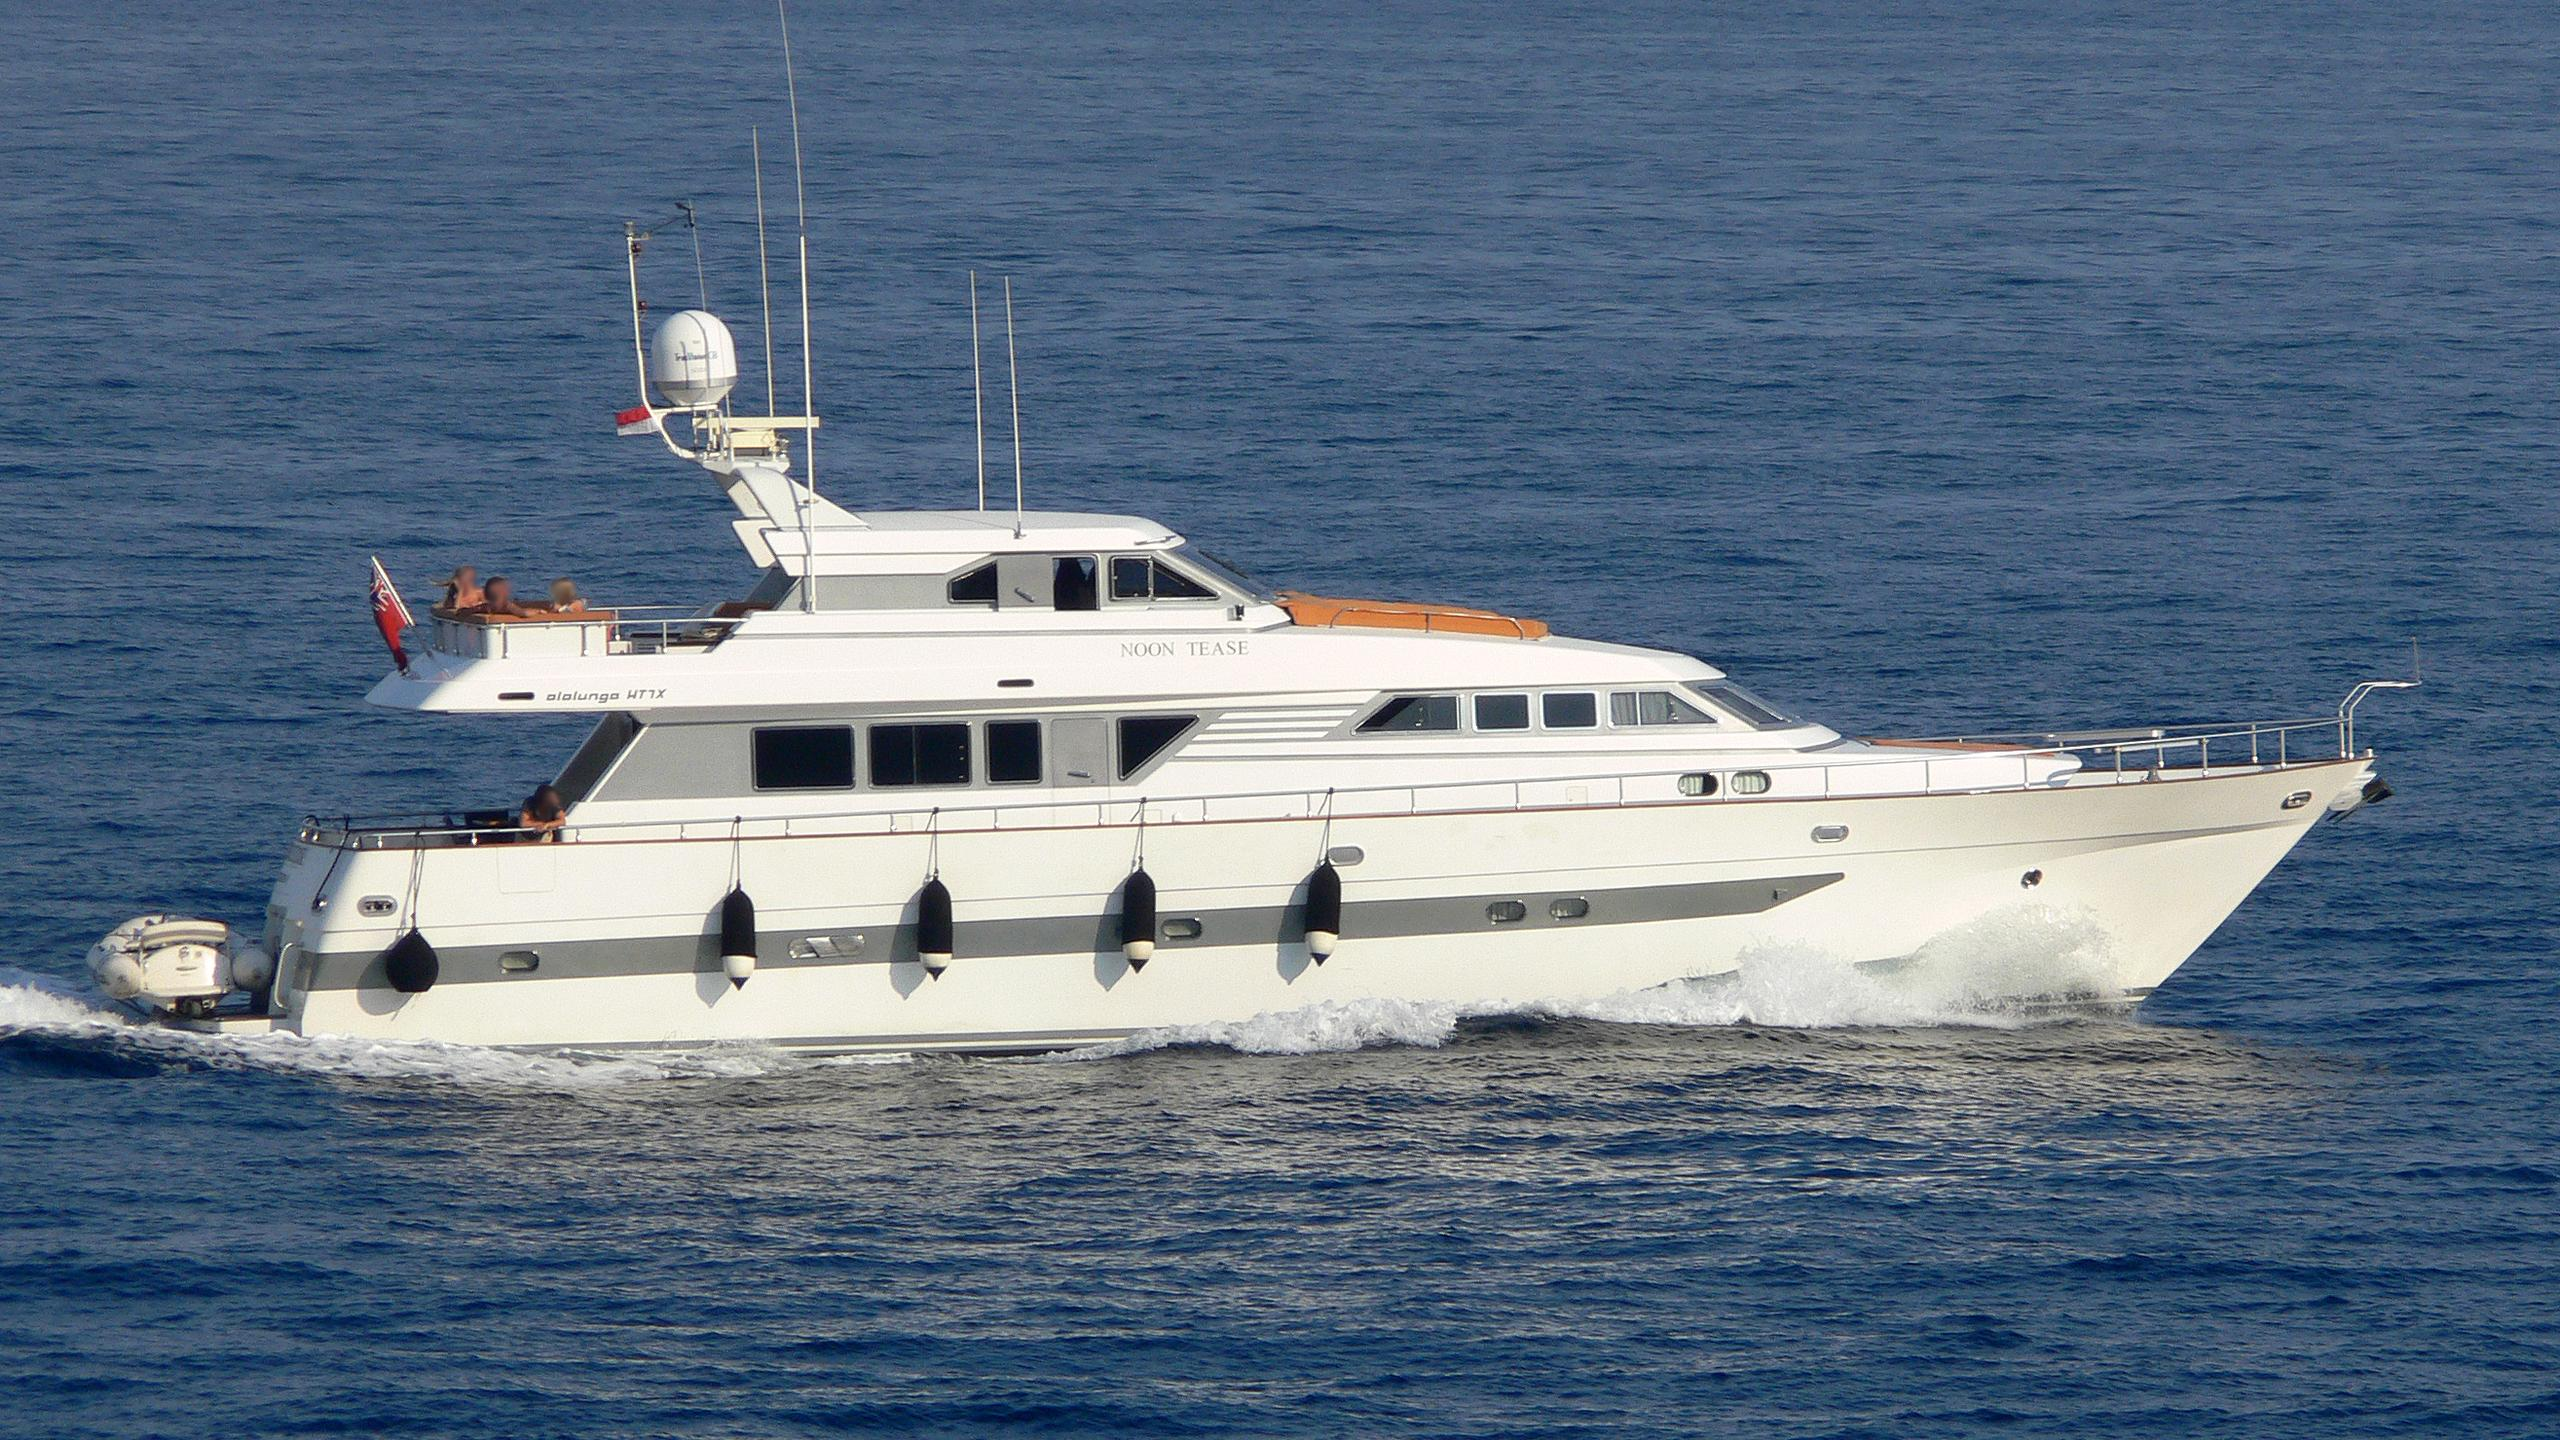 noon-tease-yacht-exterior